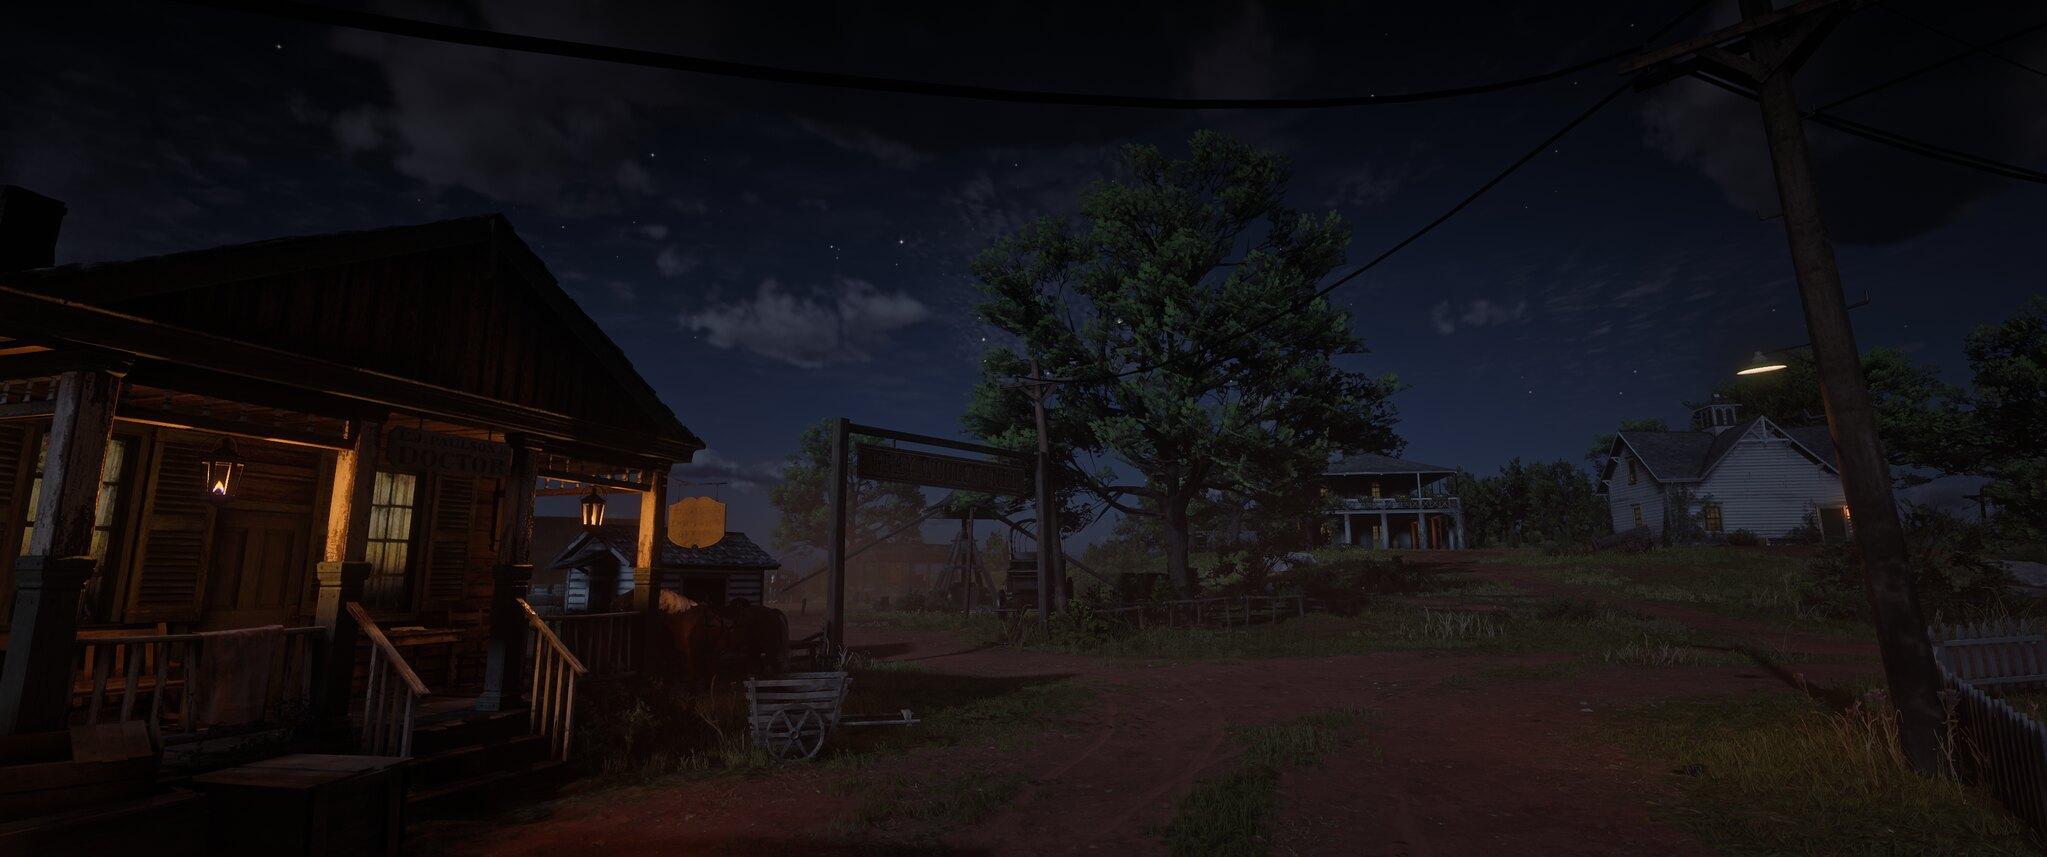 49048180298_7693343a23_k.jpg - Red Dead Redemption 2